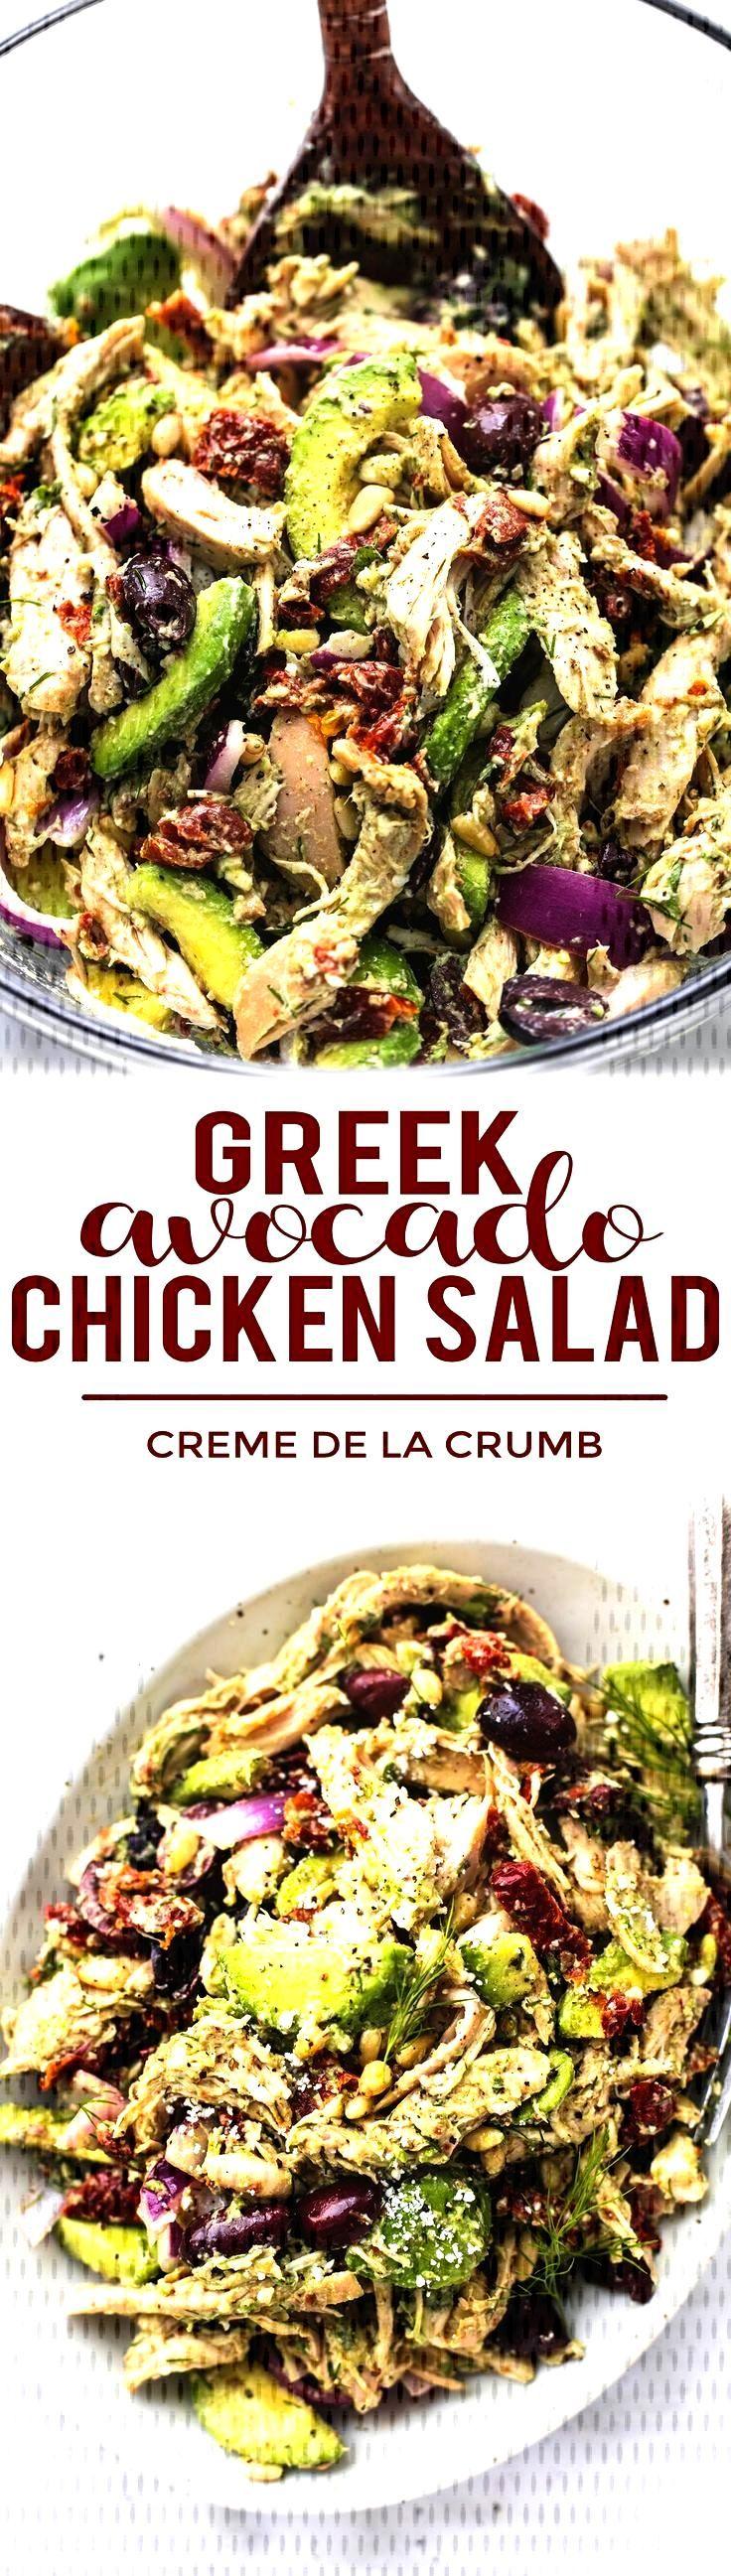 Easy healthy Greek Avocado Chicken Salad with light greek yogurt lemon herb dres... -